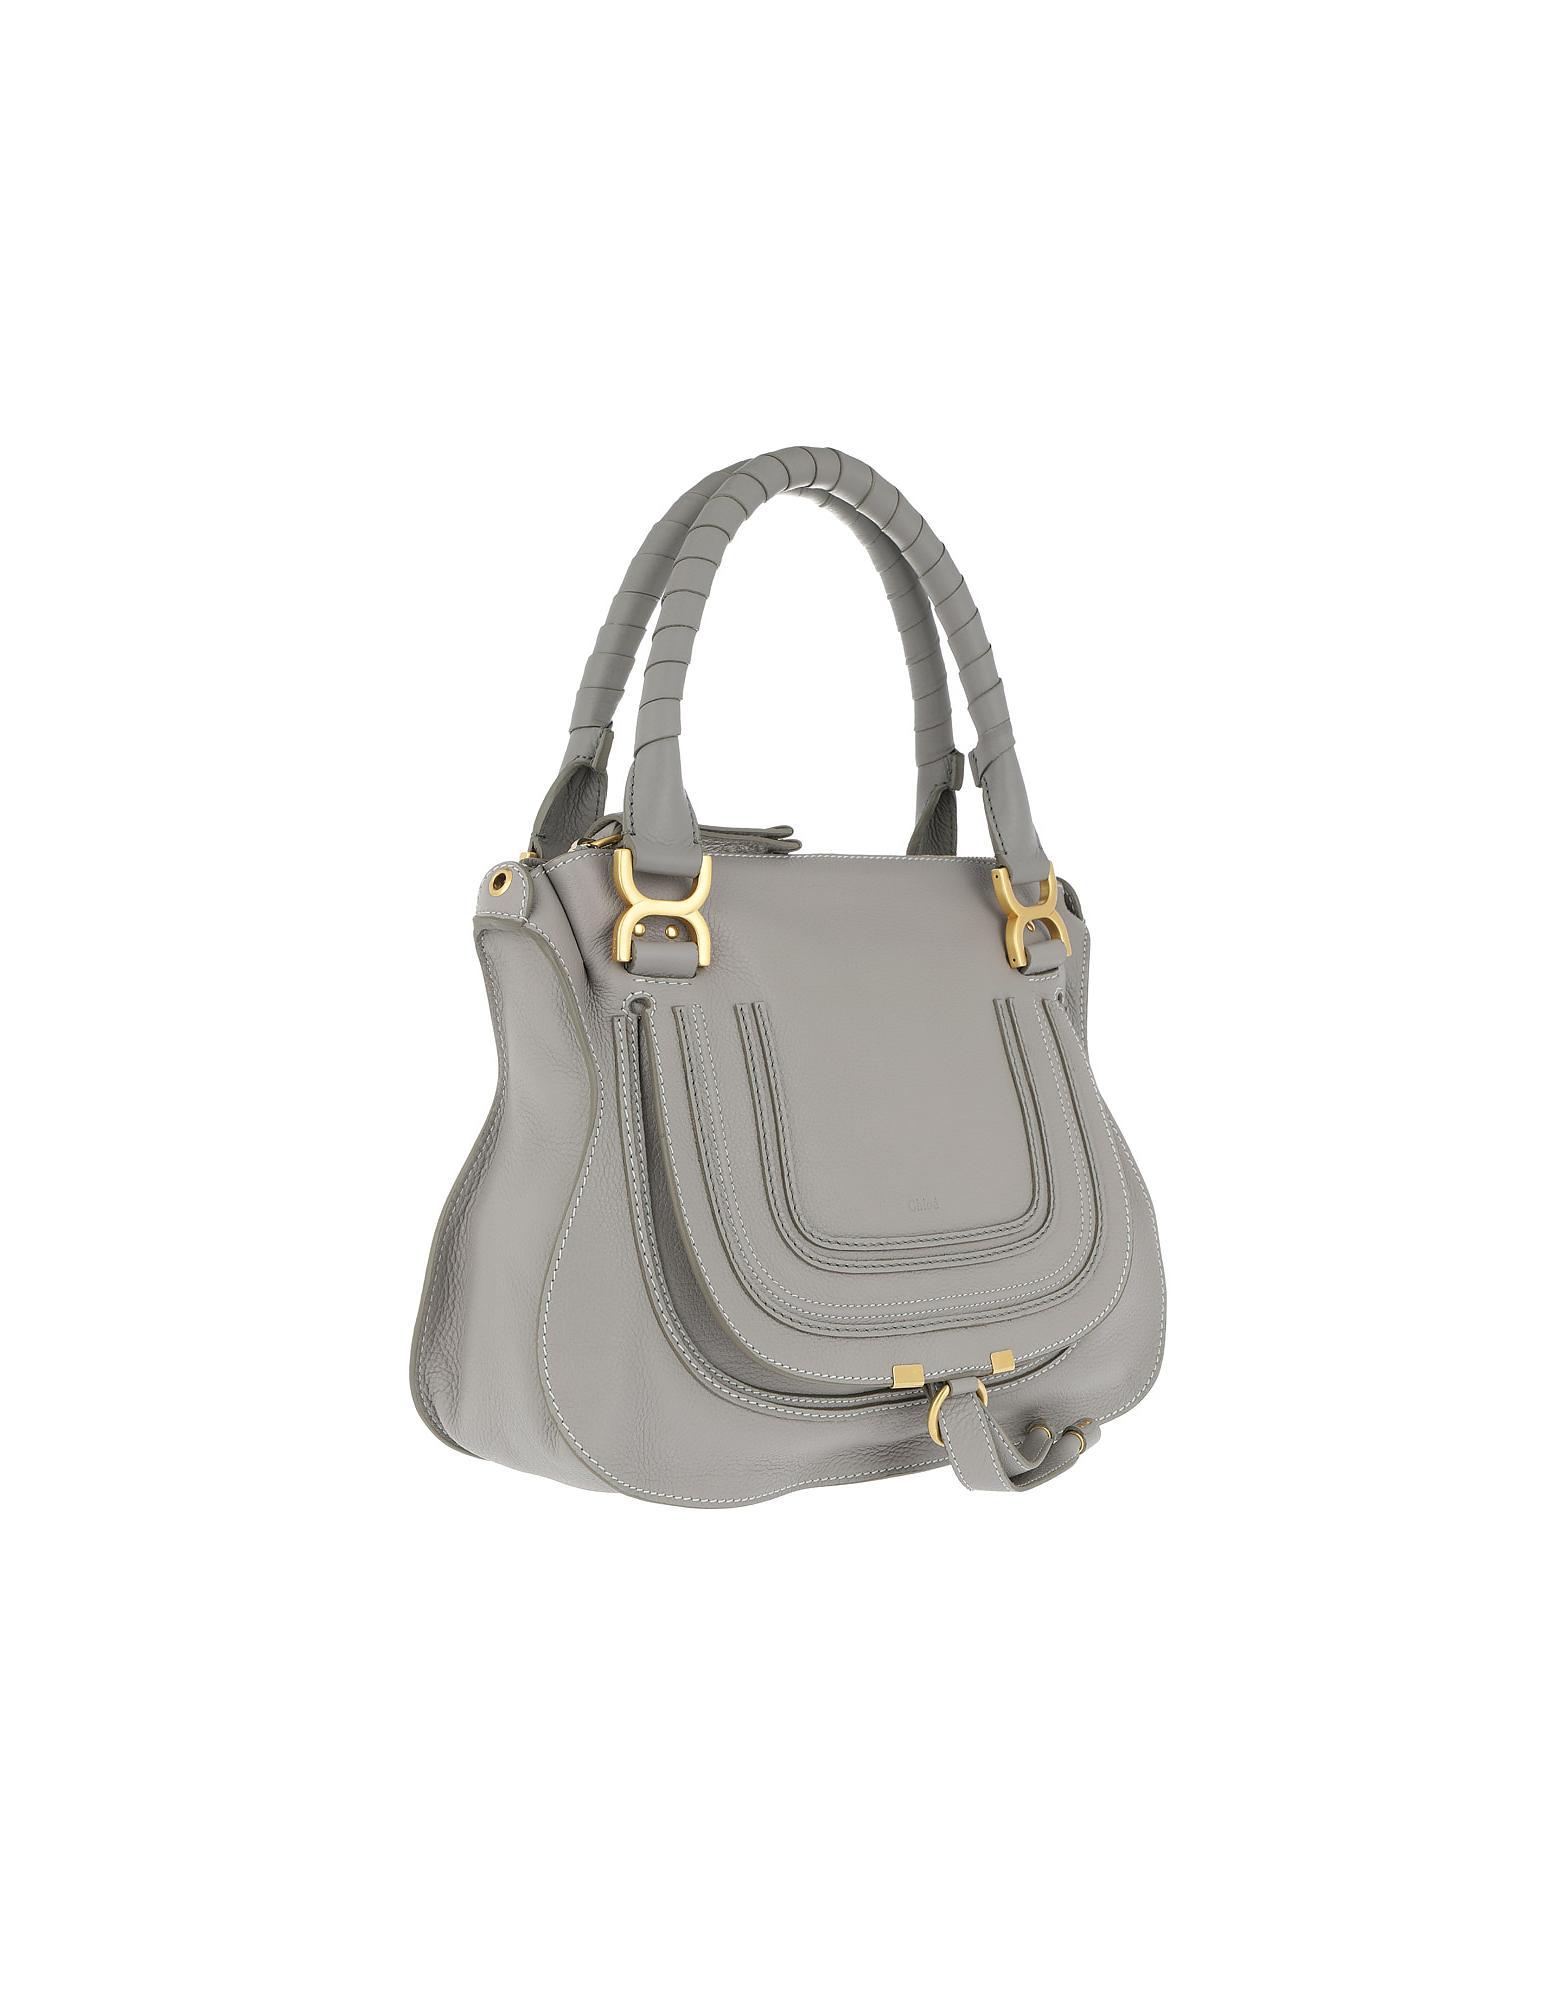 4c7e8d26393 Chloé Marcie Medium Shoulder Bag Cashmere Grey in Gray - Lyst